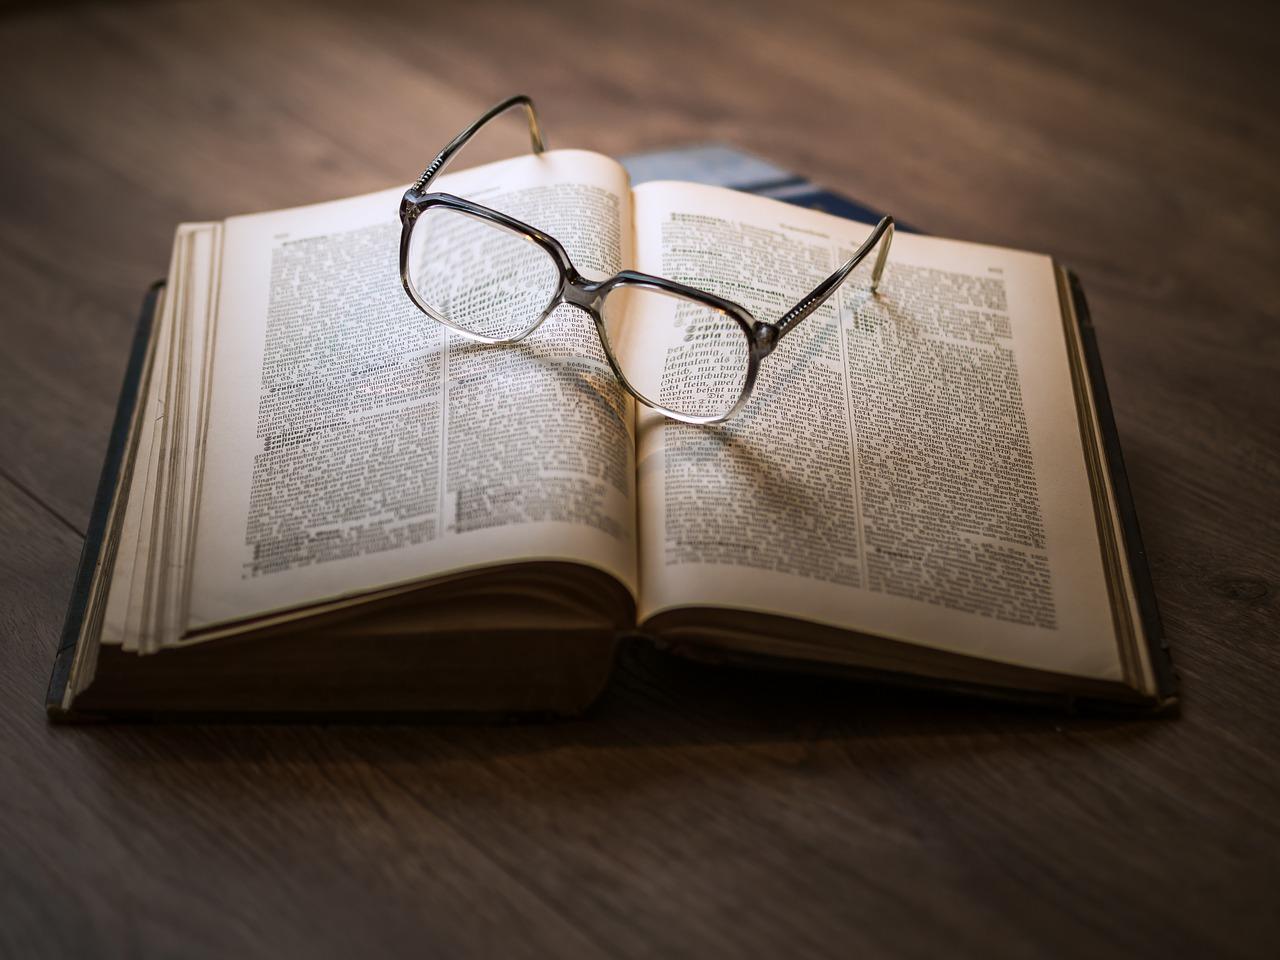 https://pixabay.com/it/photos/conoscenza-libro-biblioteca-1052010/